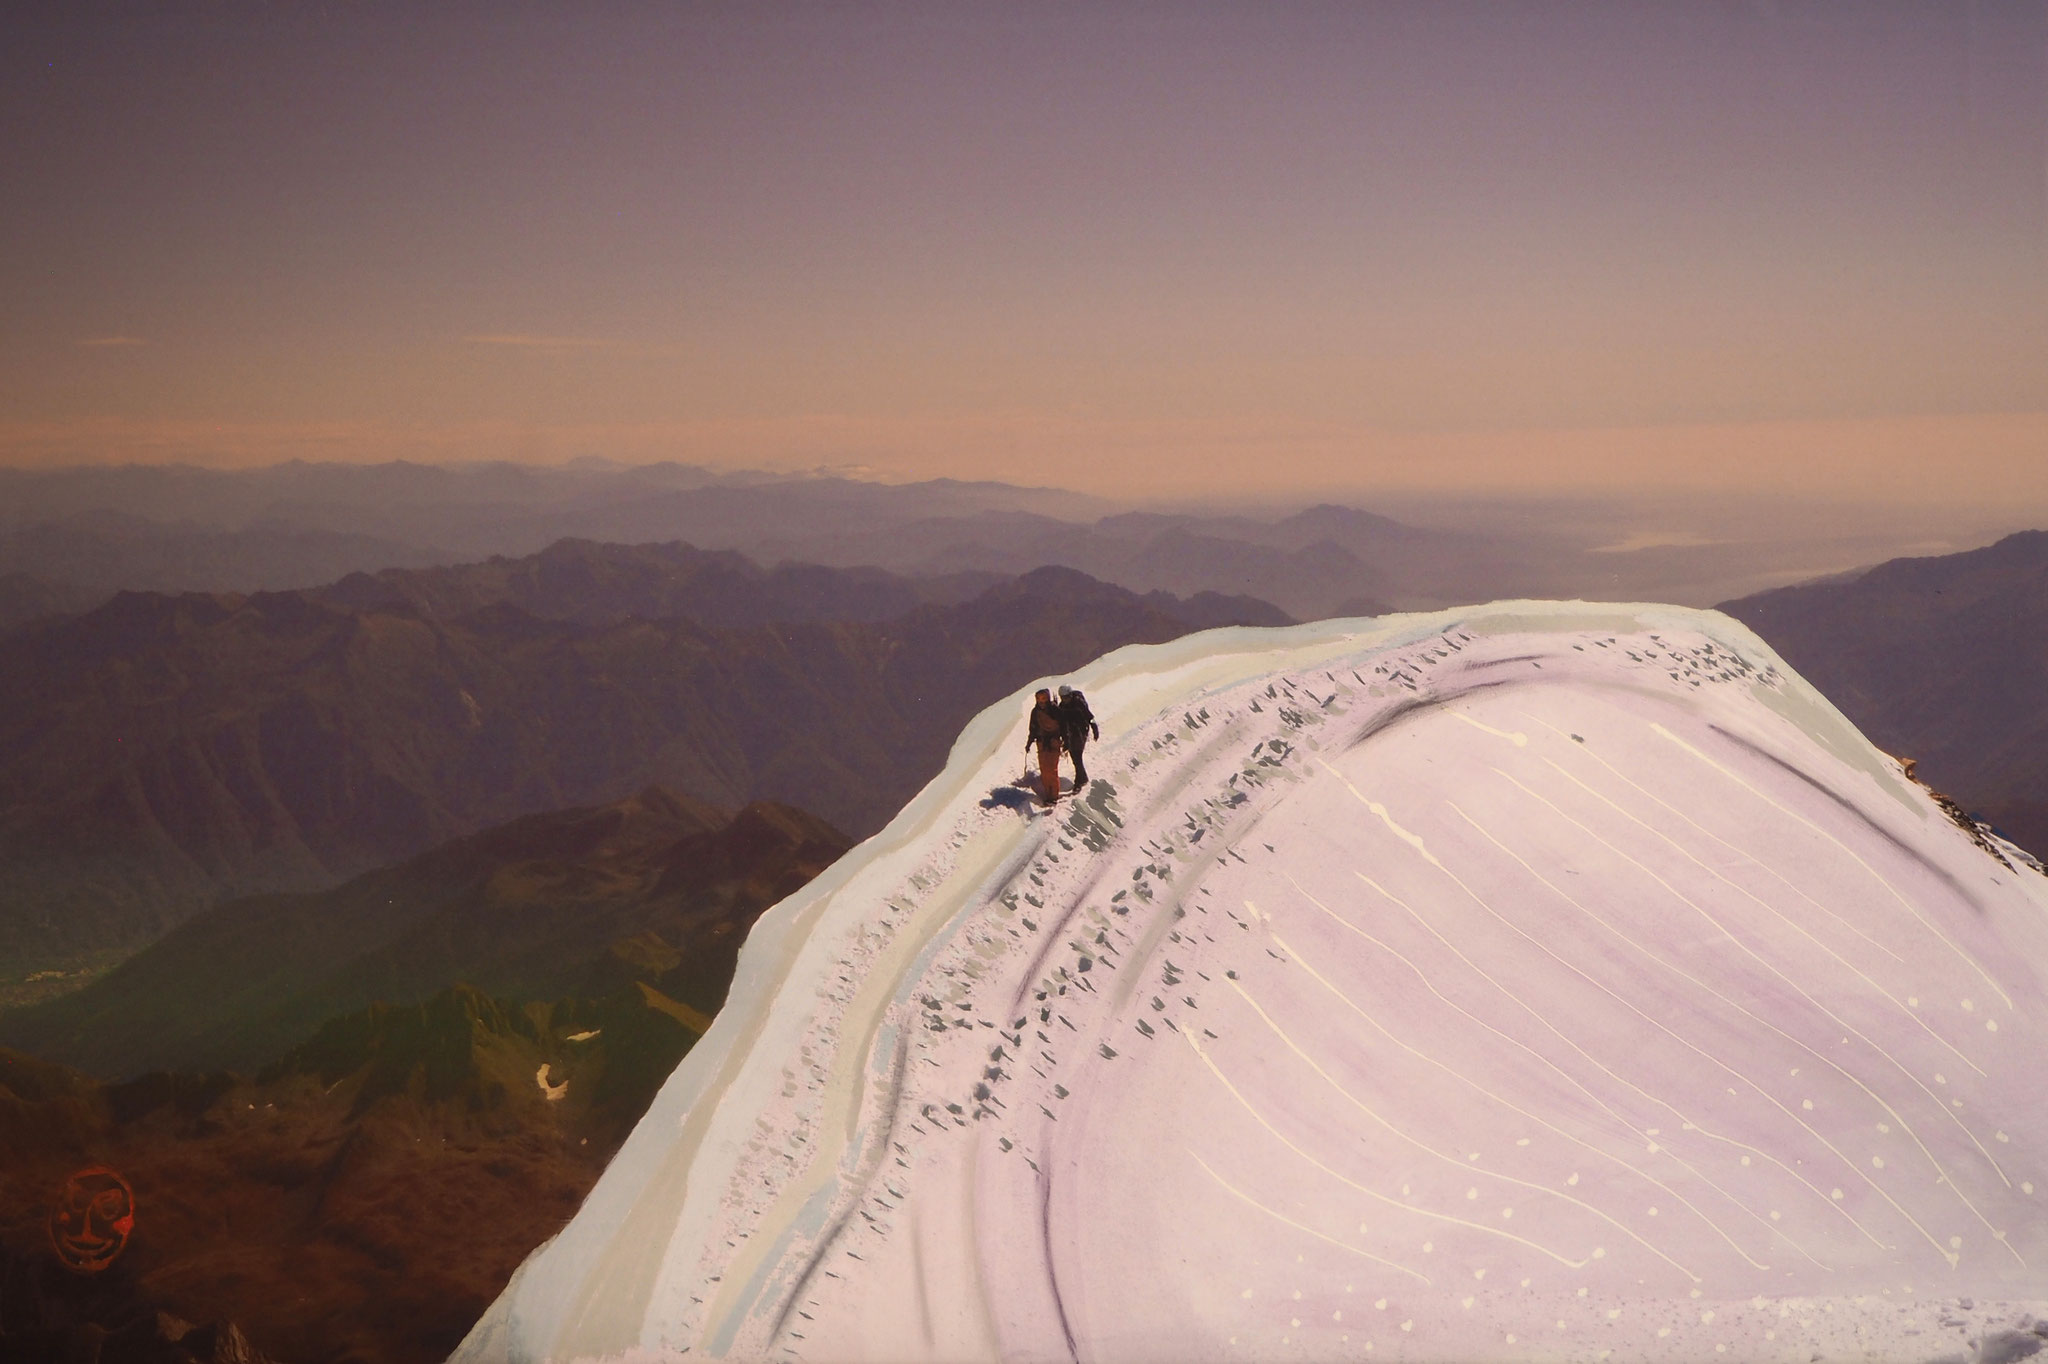 Weissnicht 90cmx60cm - Gipfelgrat Weissmies 4017m